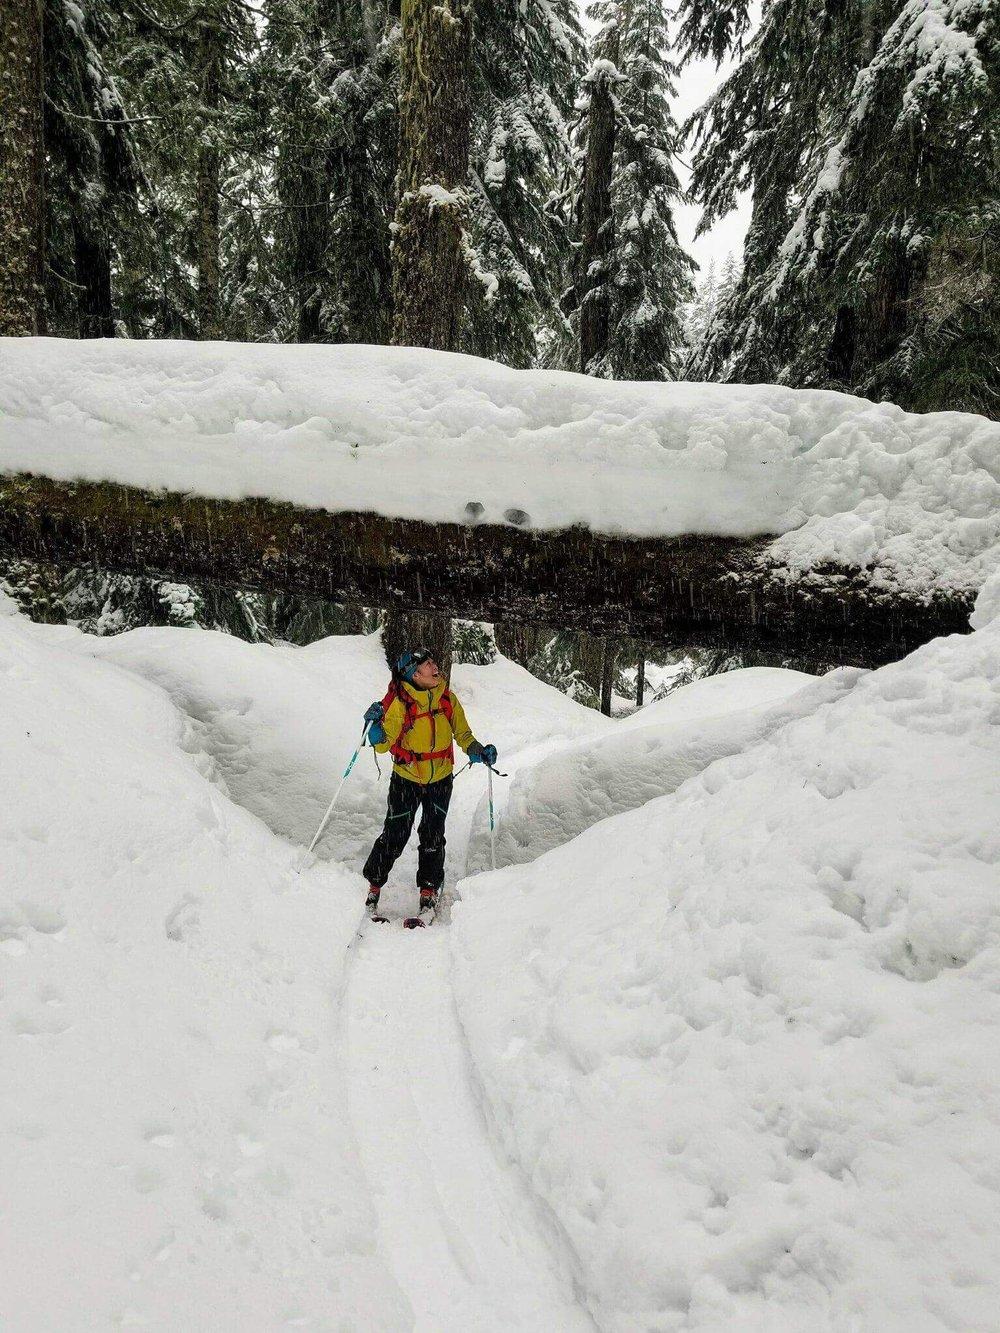 Winter wonderland! Photo by Tony.